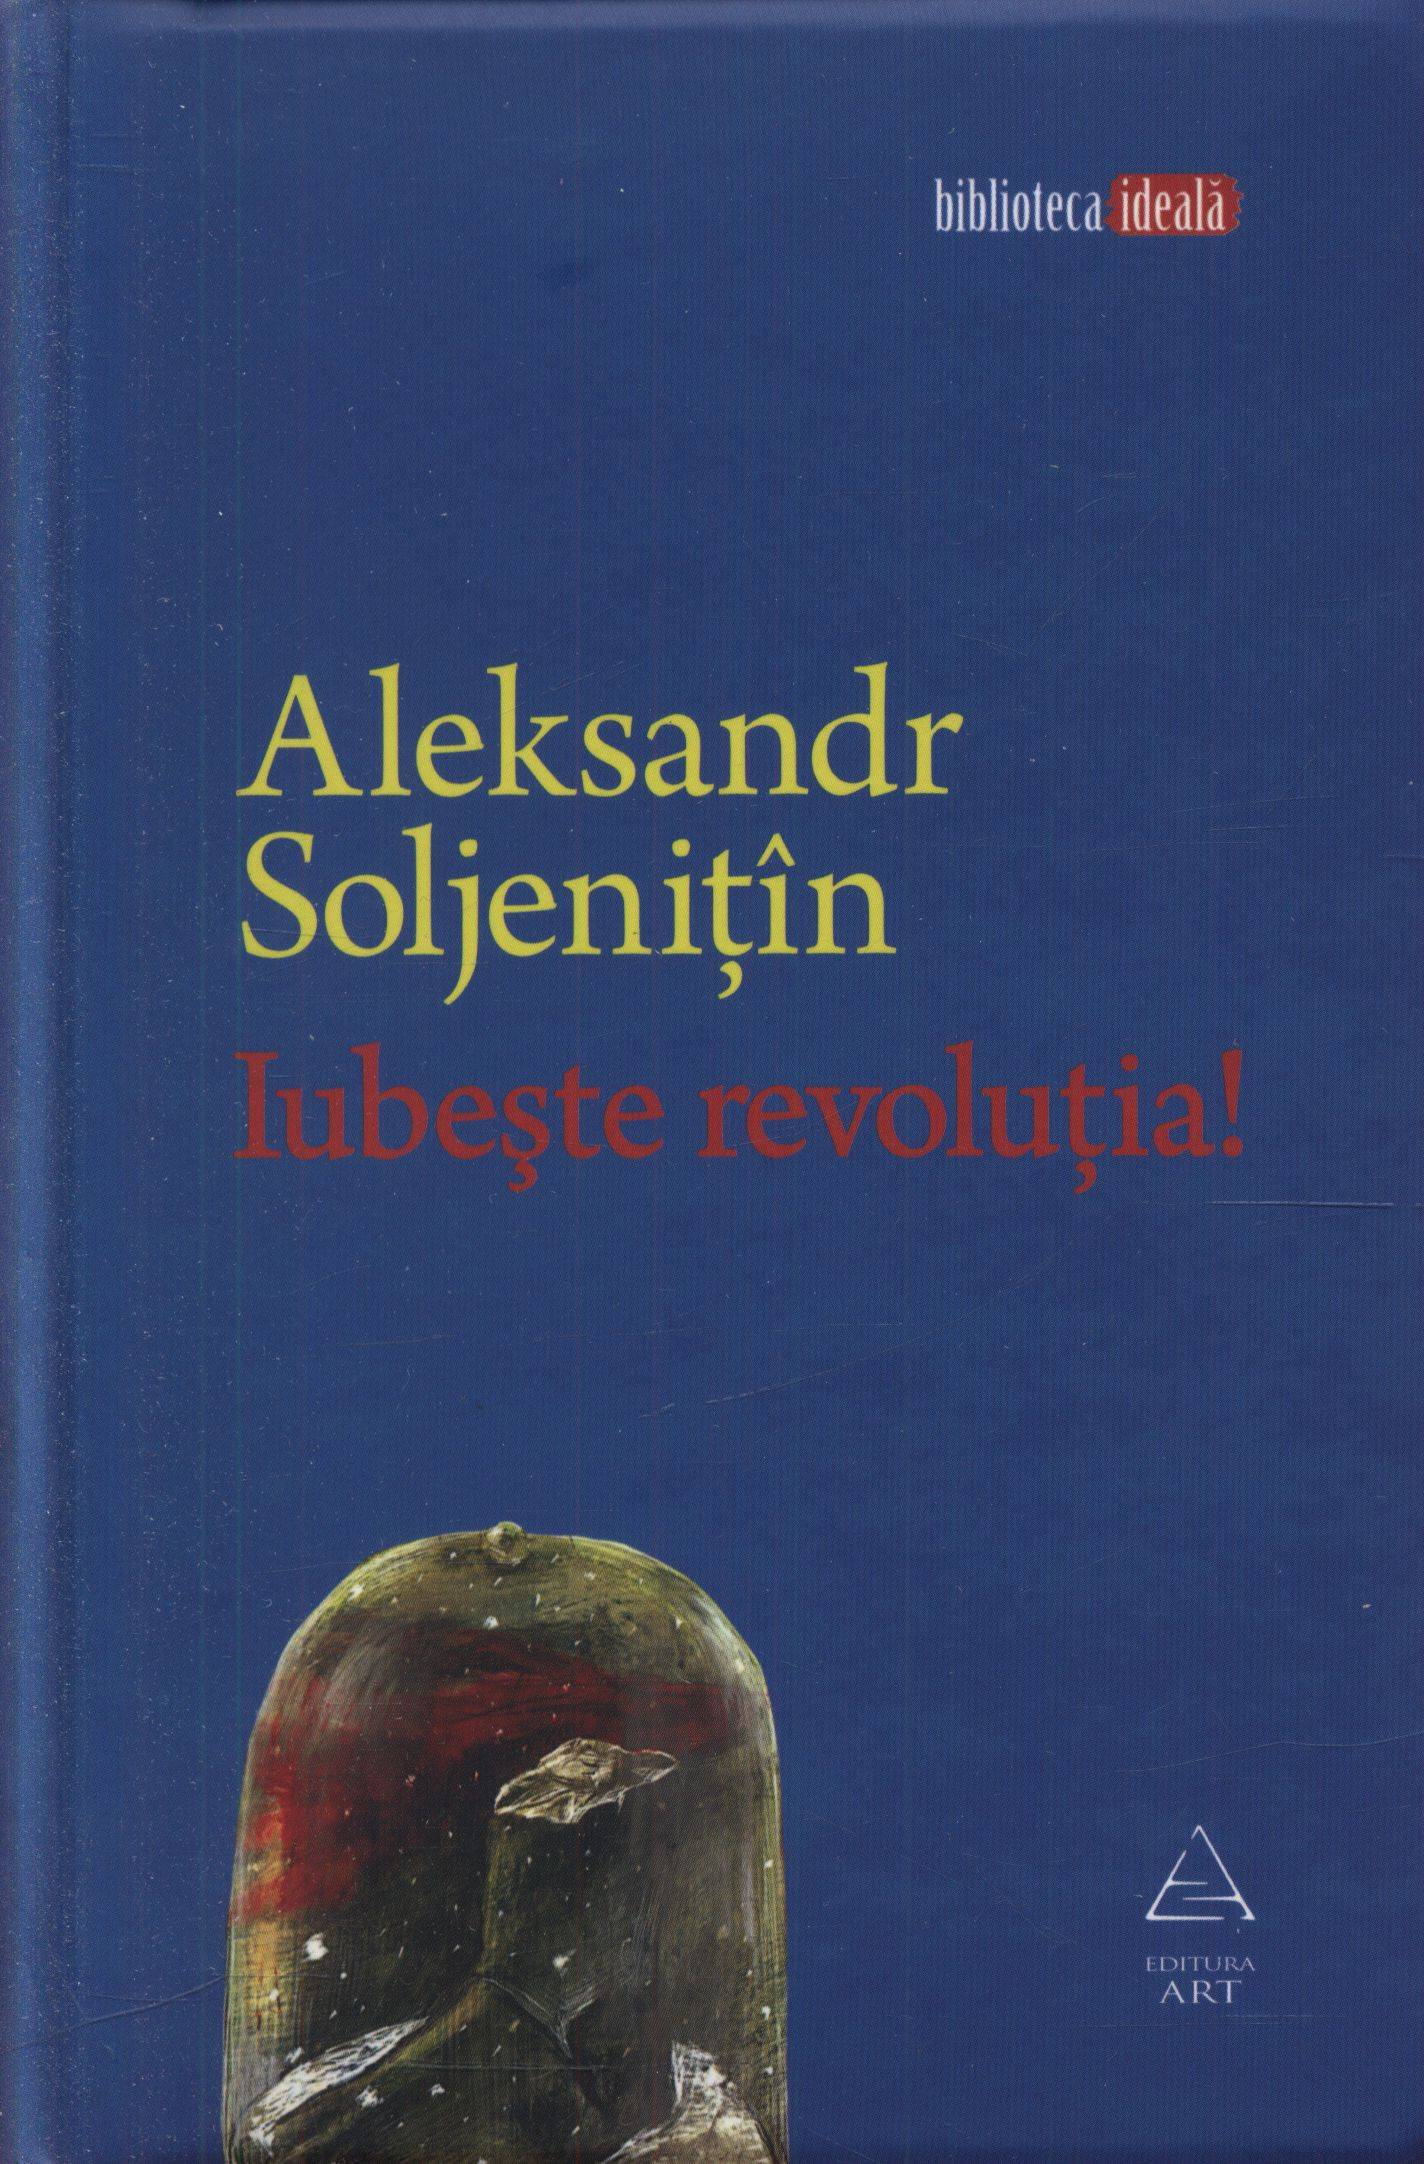 Iubeste revolutia!, de Aleksandr Soljenitin